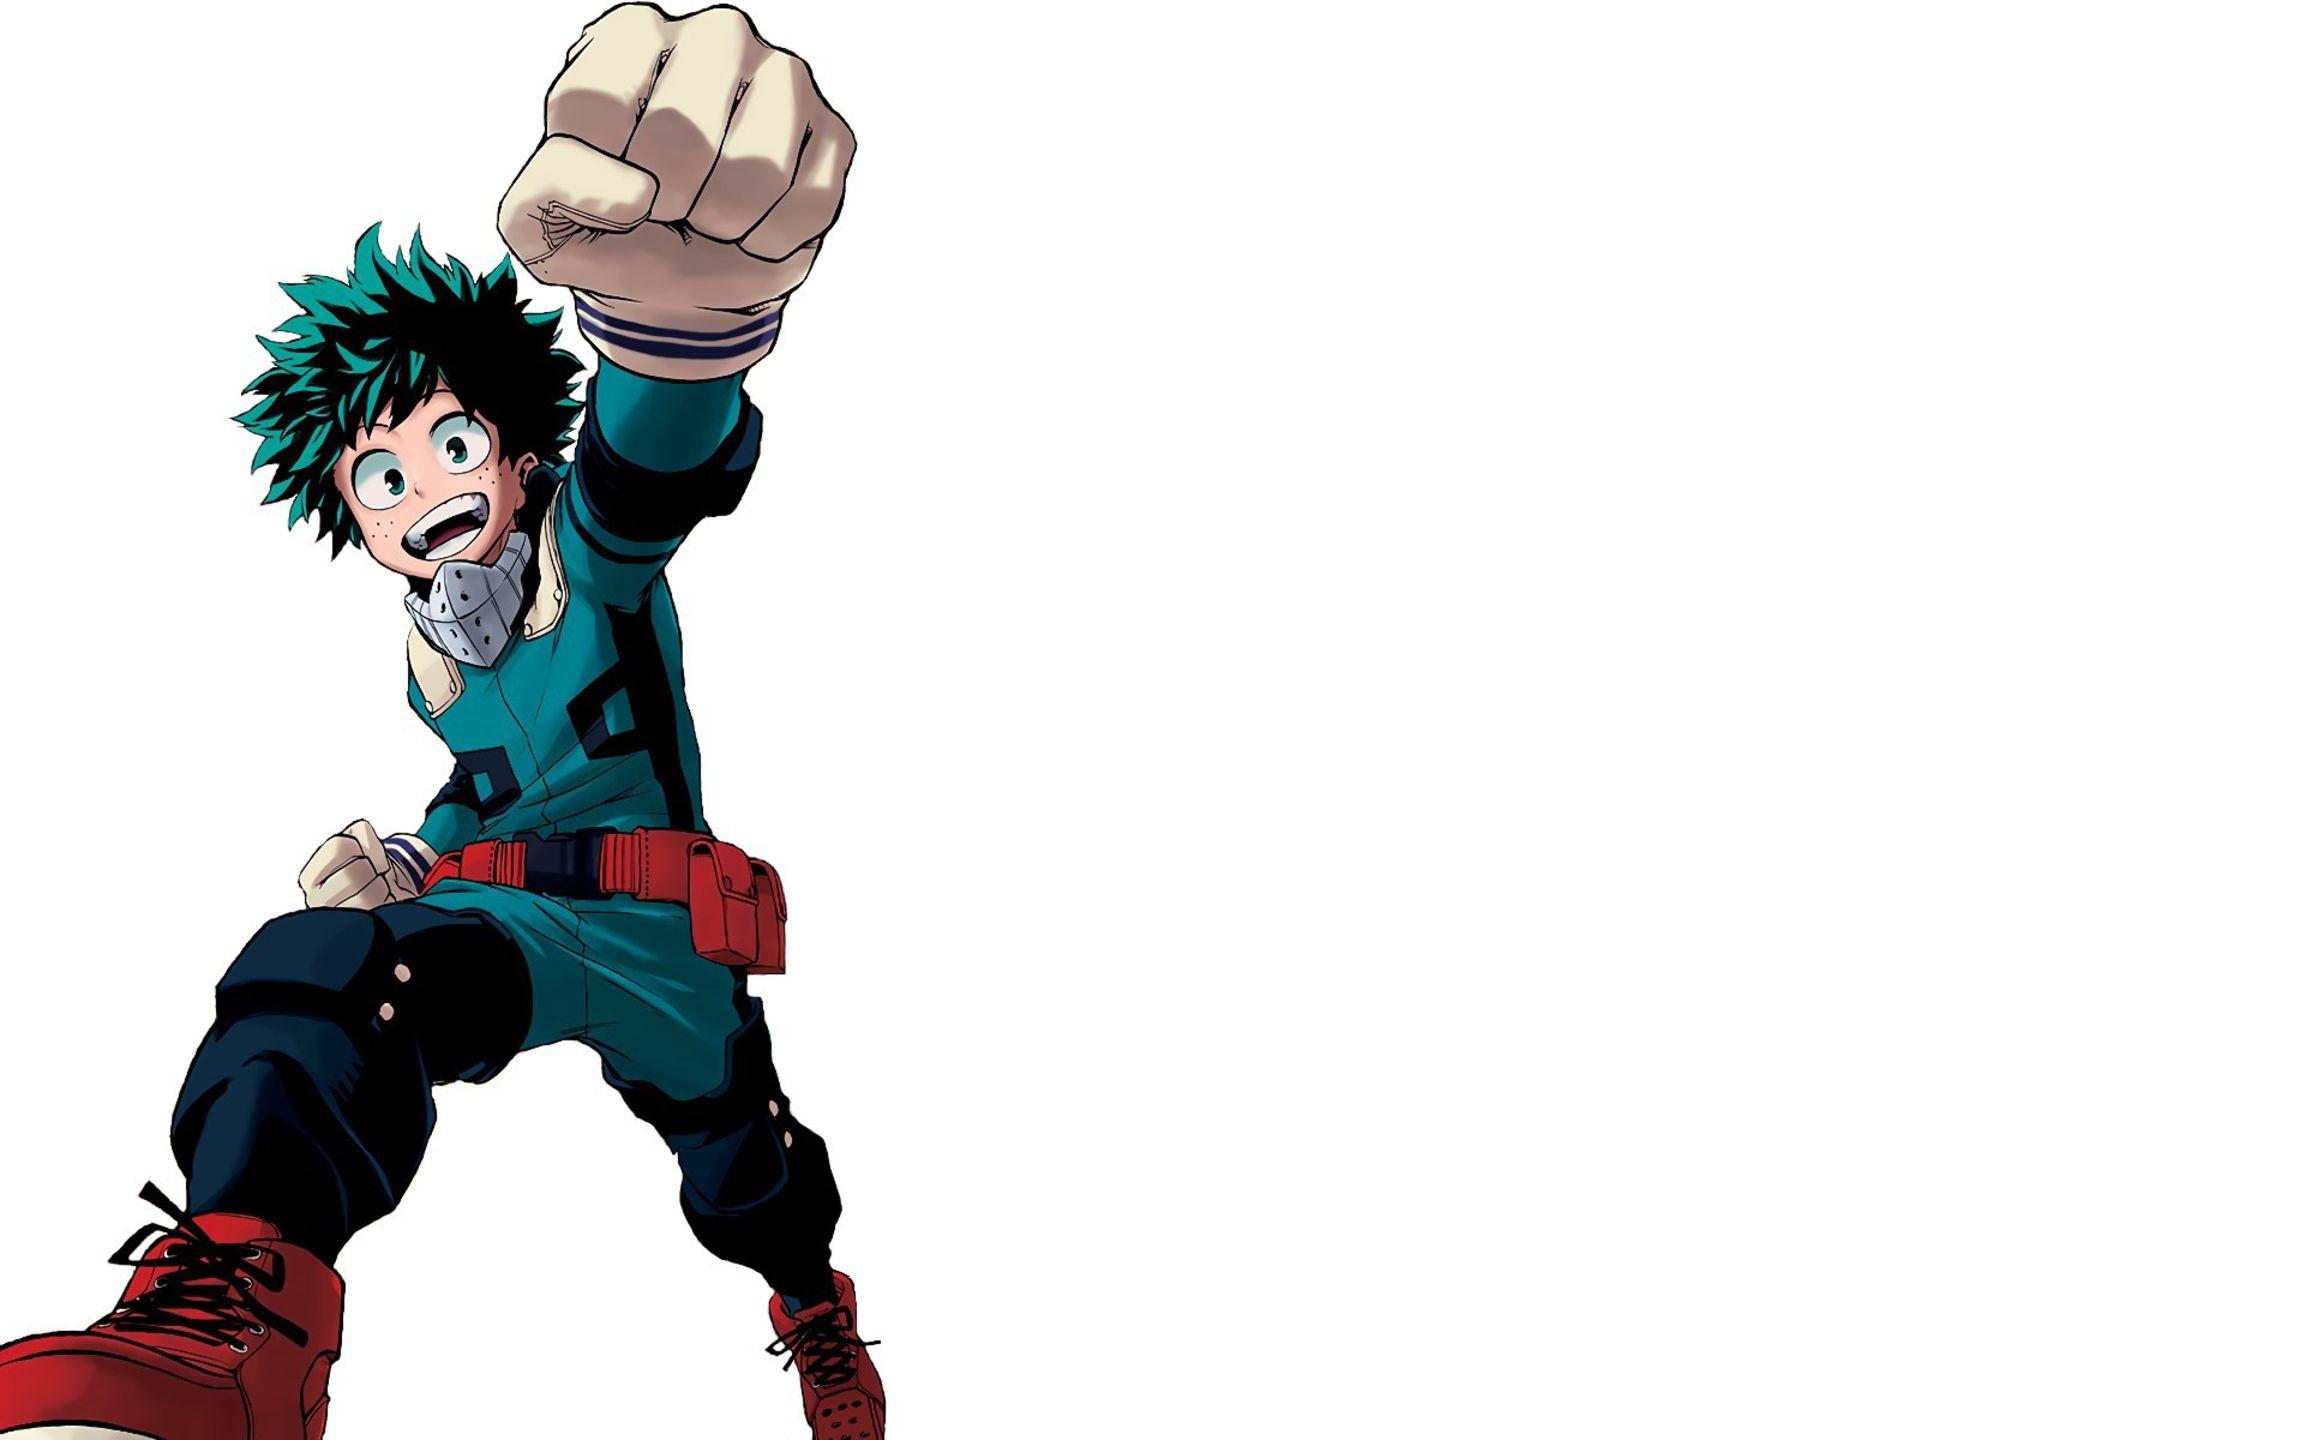 Boku No Hero Academia Hd Wallpapers New Tab Install Boku No Hero Academia New Tab And Get Hd Wallpapers Of Deku Ma Hero Wallpaper Boku No Hero Academia Hero